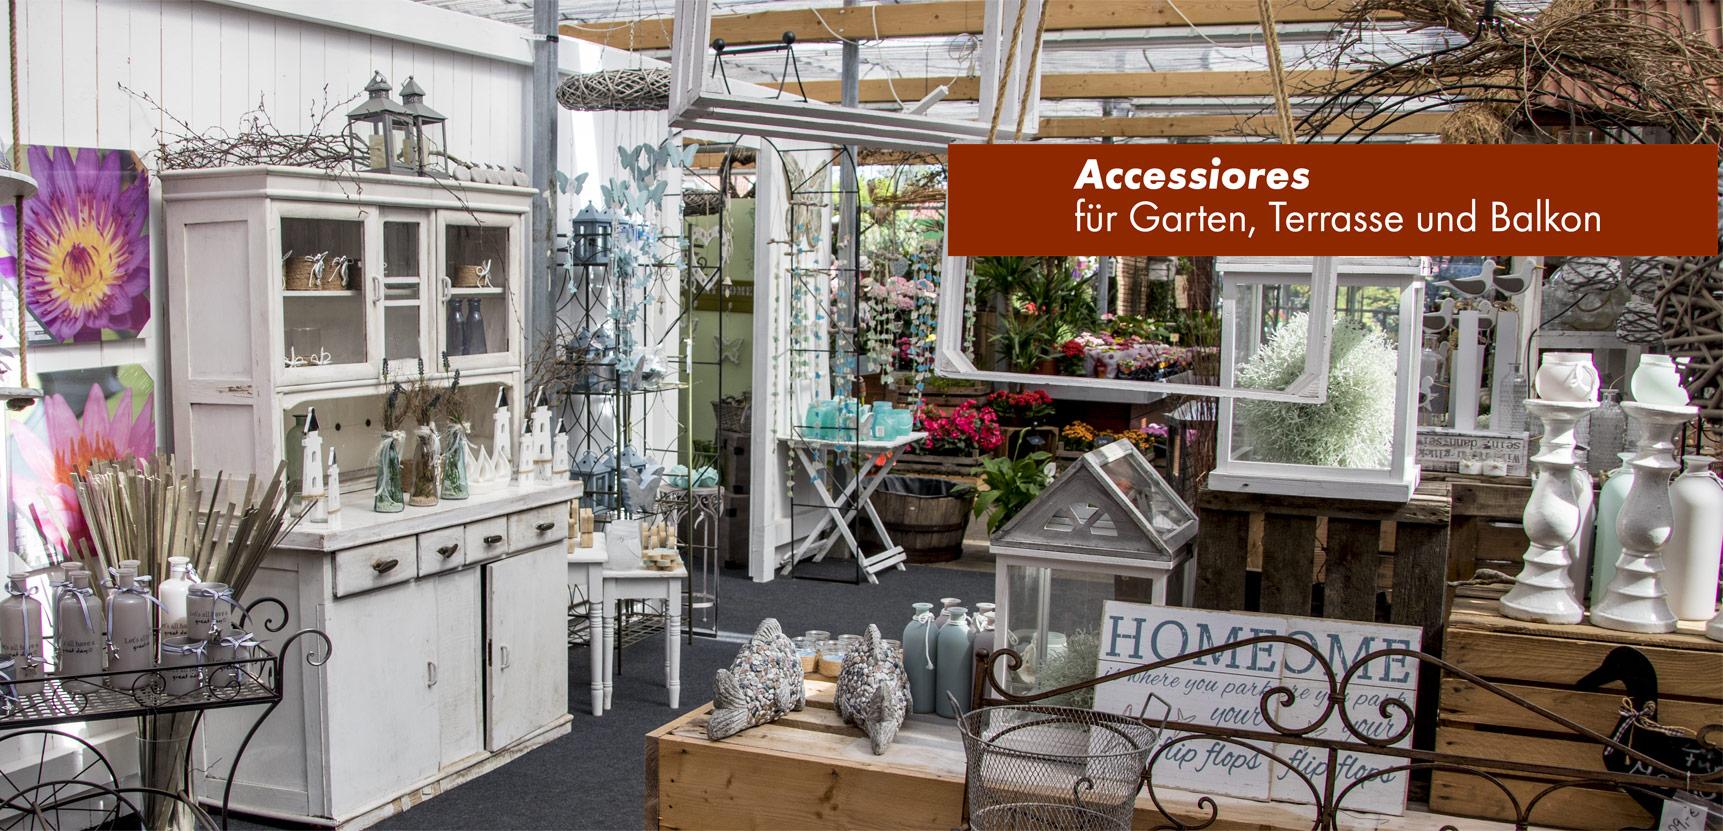 best accessoires fr garten terrasse und balkon with balkon accessoires. Black Bedroom Furniture Sets. Home Design Ideas